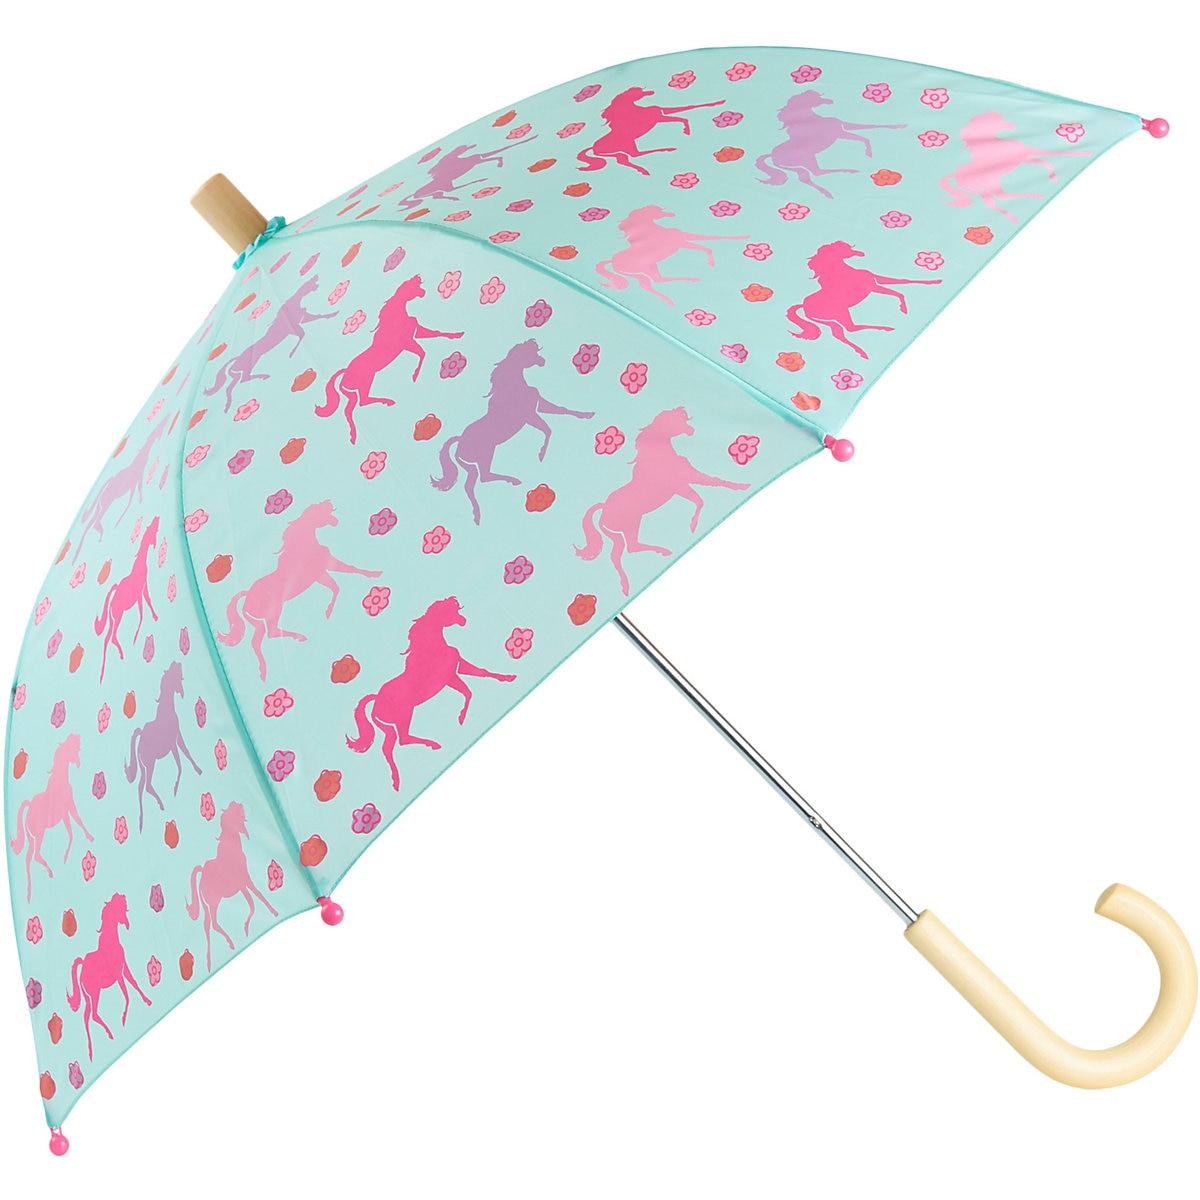 Hatley Umbrellas 10740745 umbrella rain protection for children of boys and girls